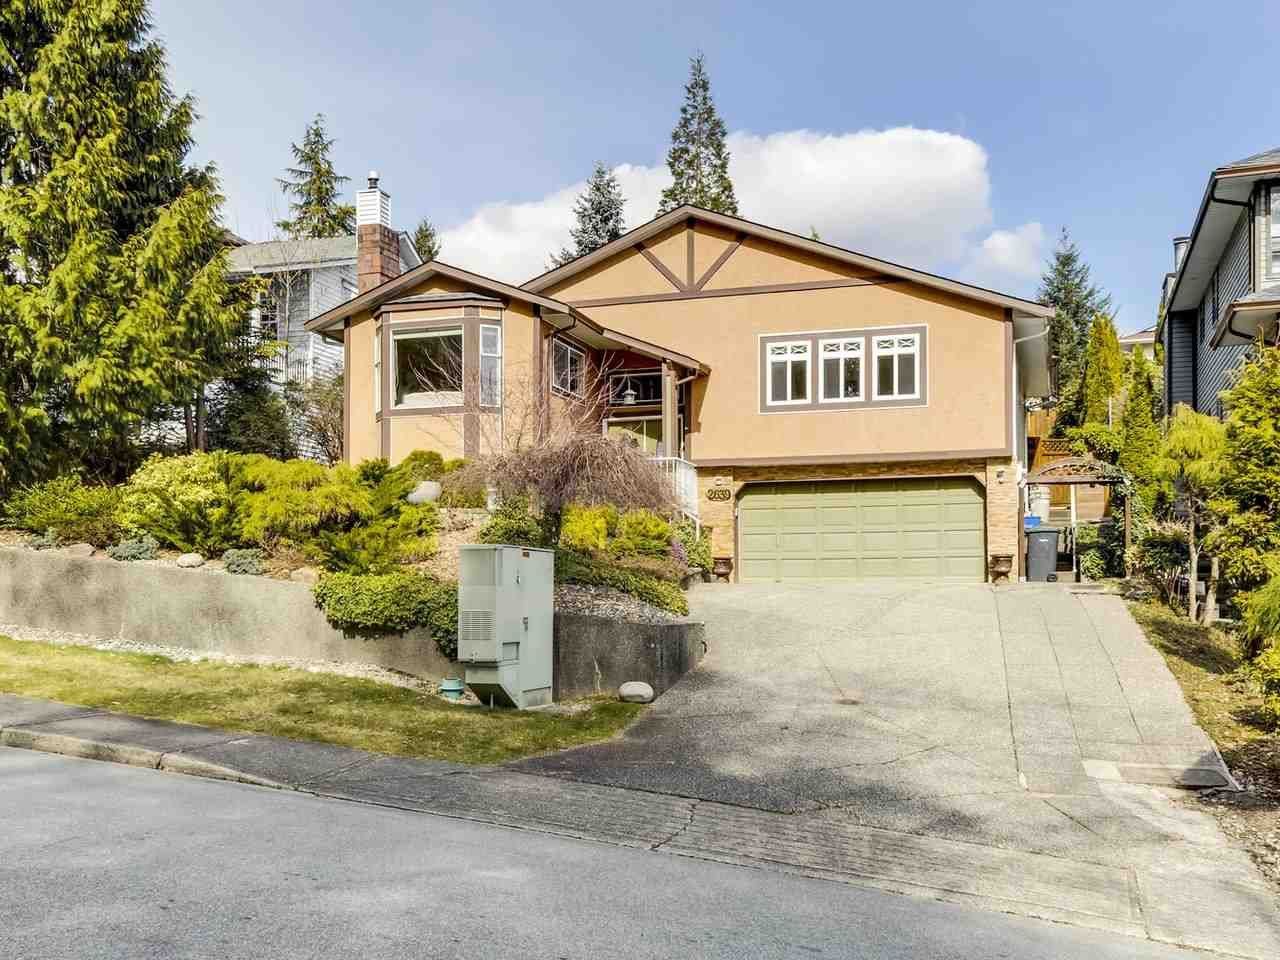 Main Photo: 2639 WALTON Avenue in Coquitlam: Scott Creek House for sale : MLS®# R2550849